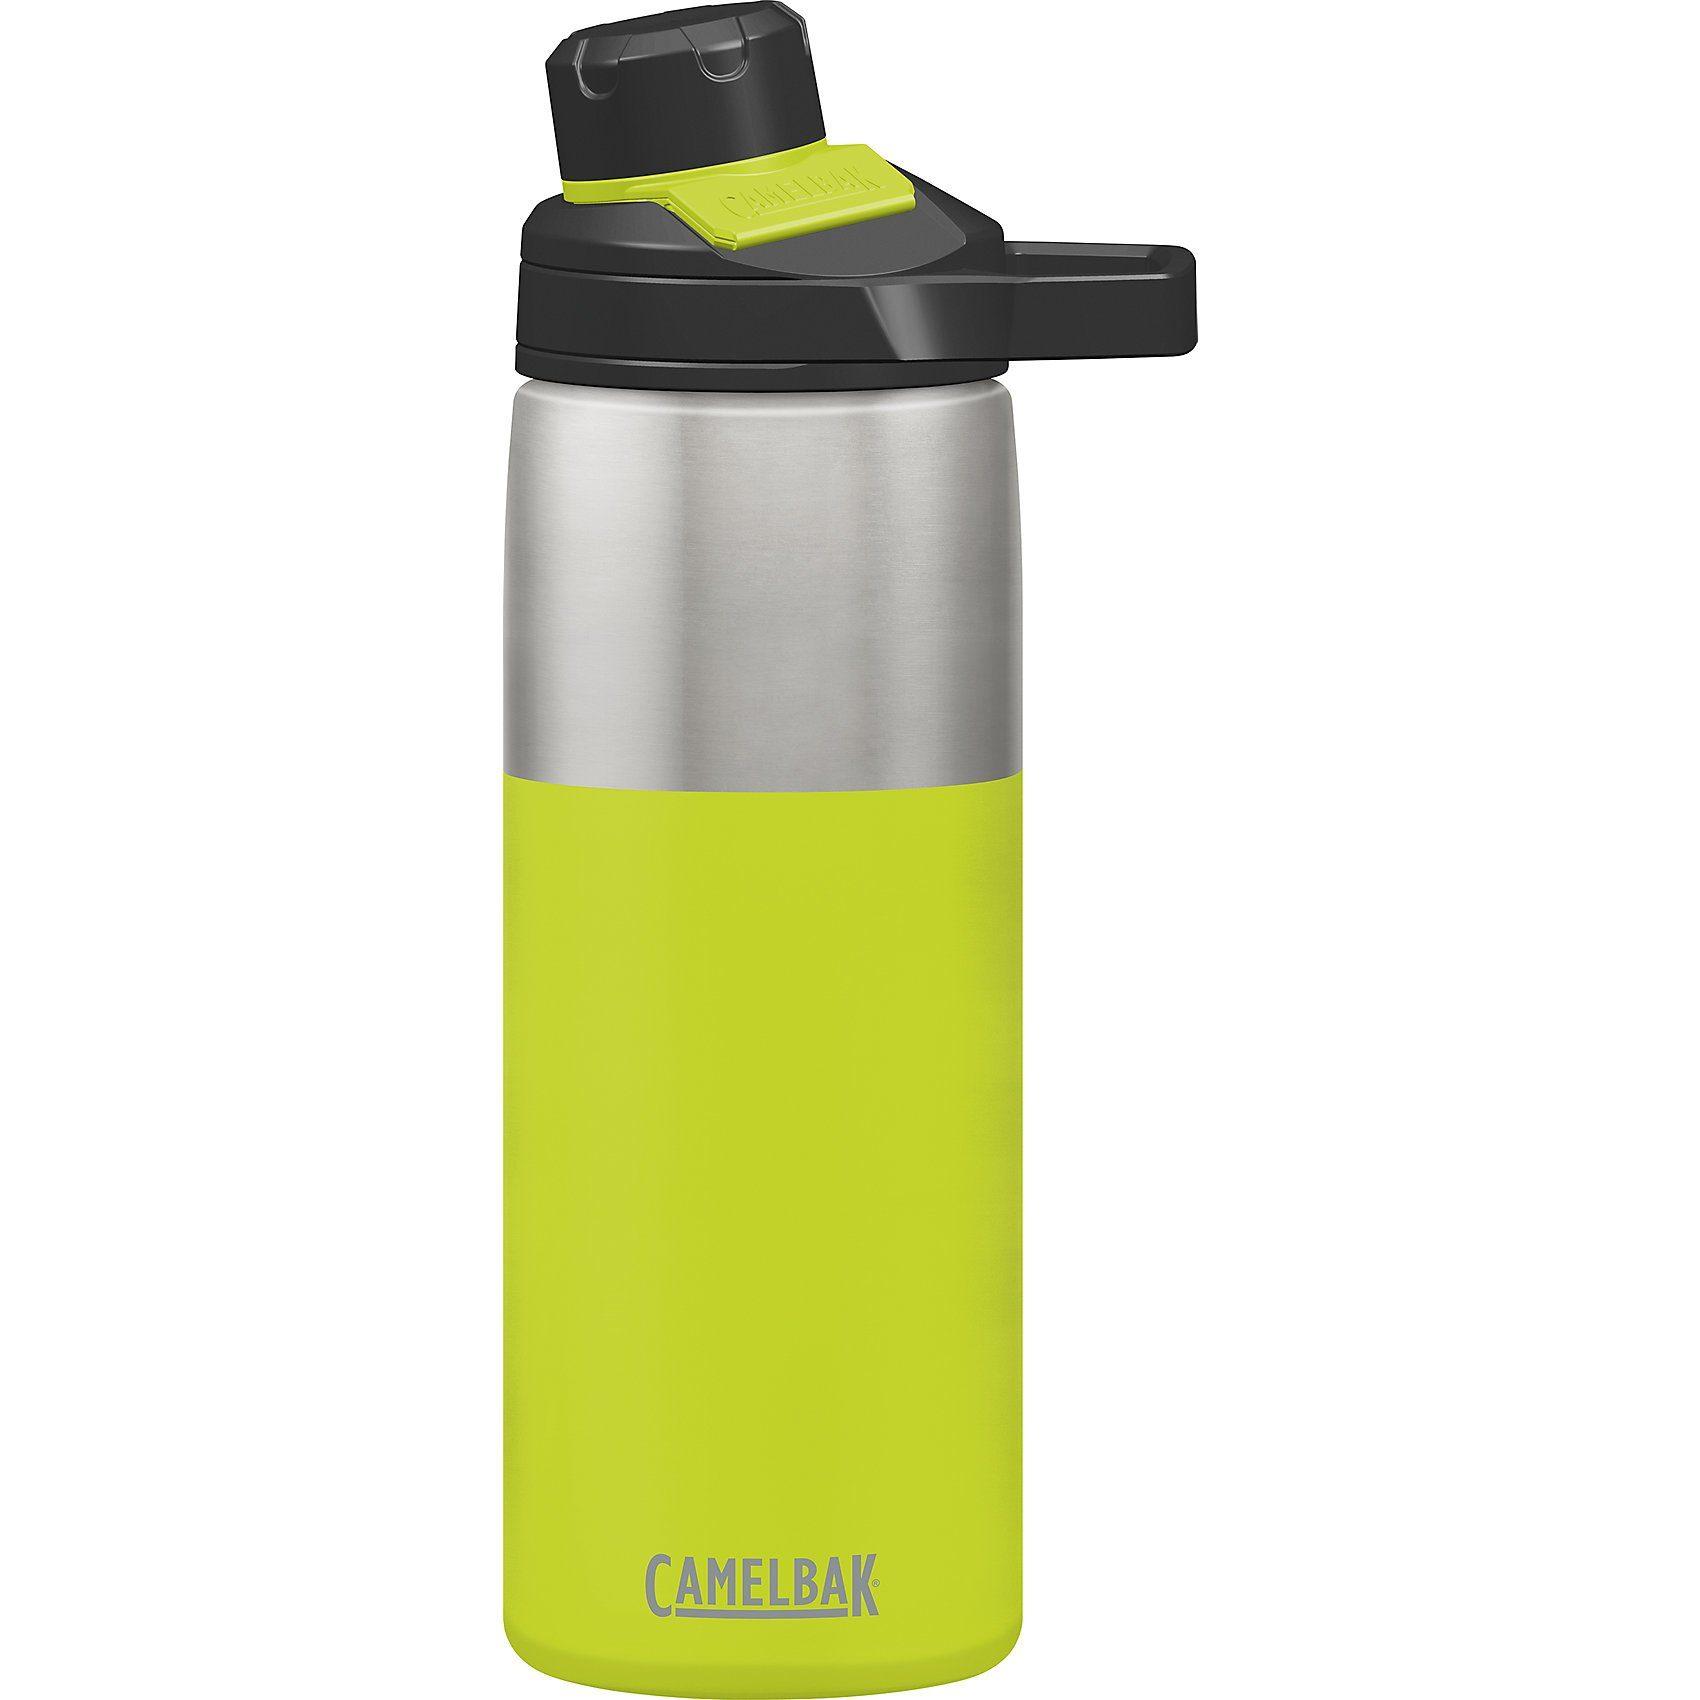 Camelbak Trink- und Thermoflasche CHUTE Lime, 600 ml